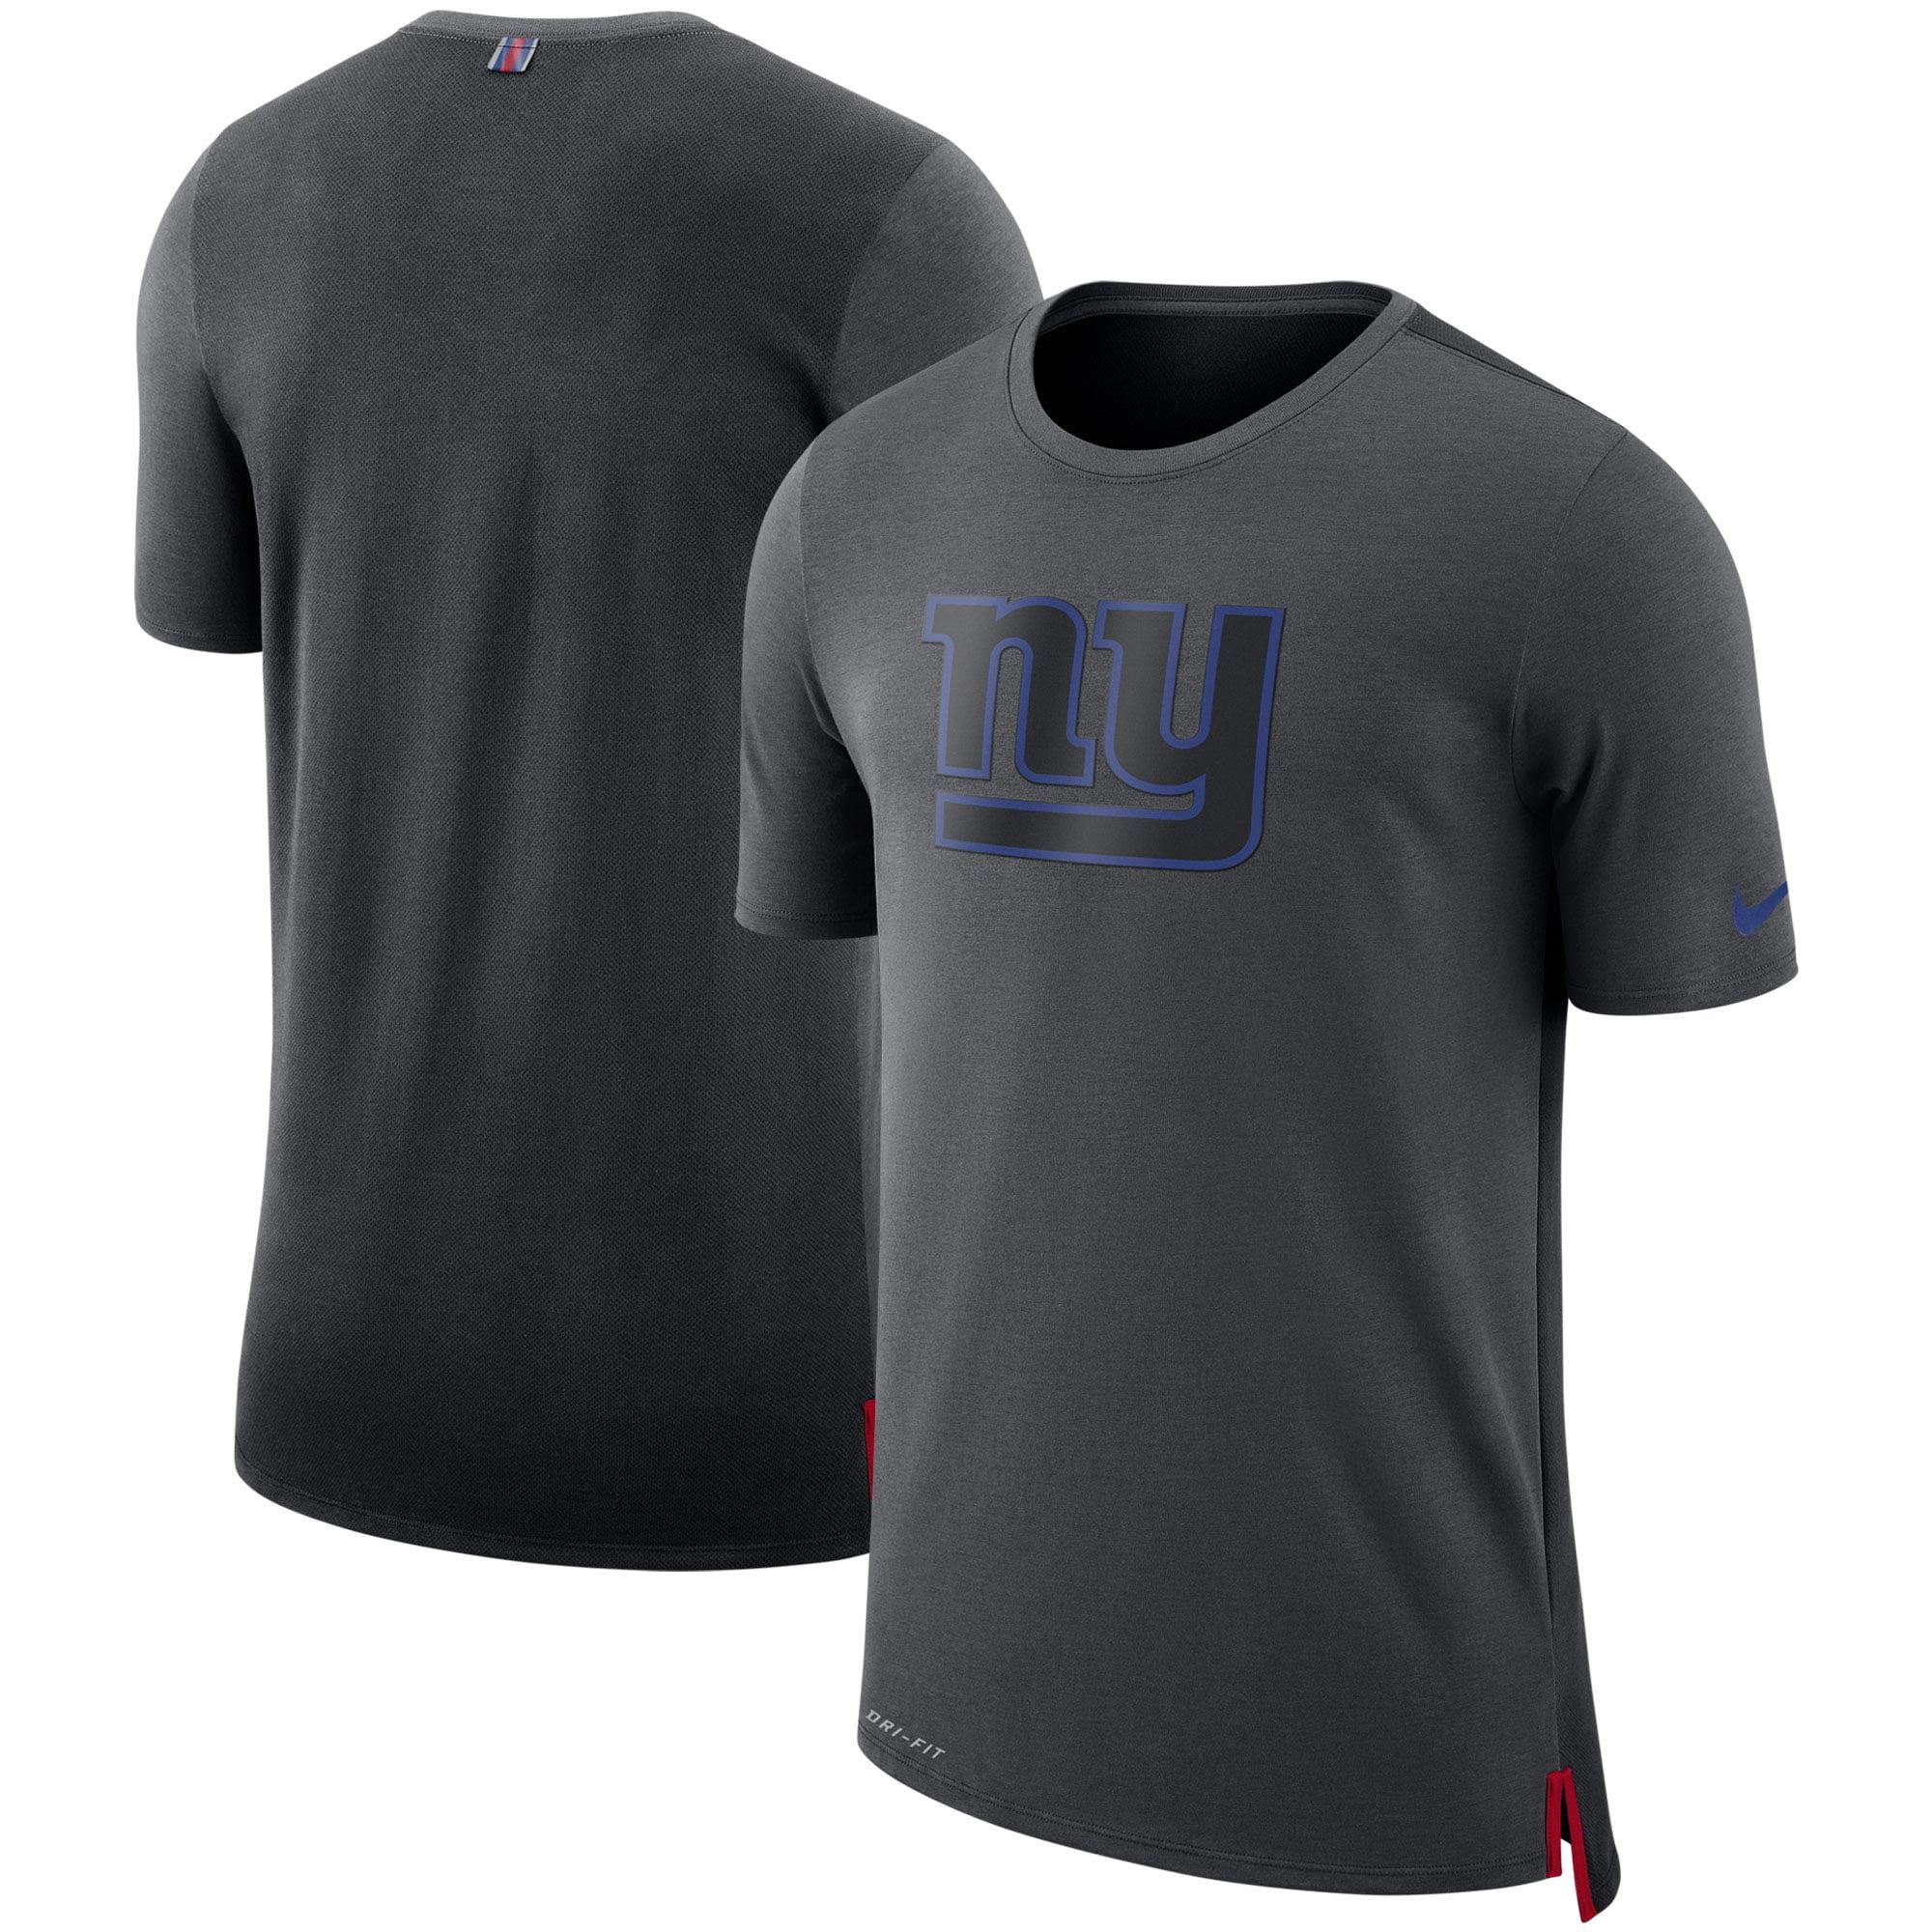 New York Giants Nike Sideline Travel Mesh Performance T-Shirt - Charcoal/Black